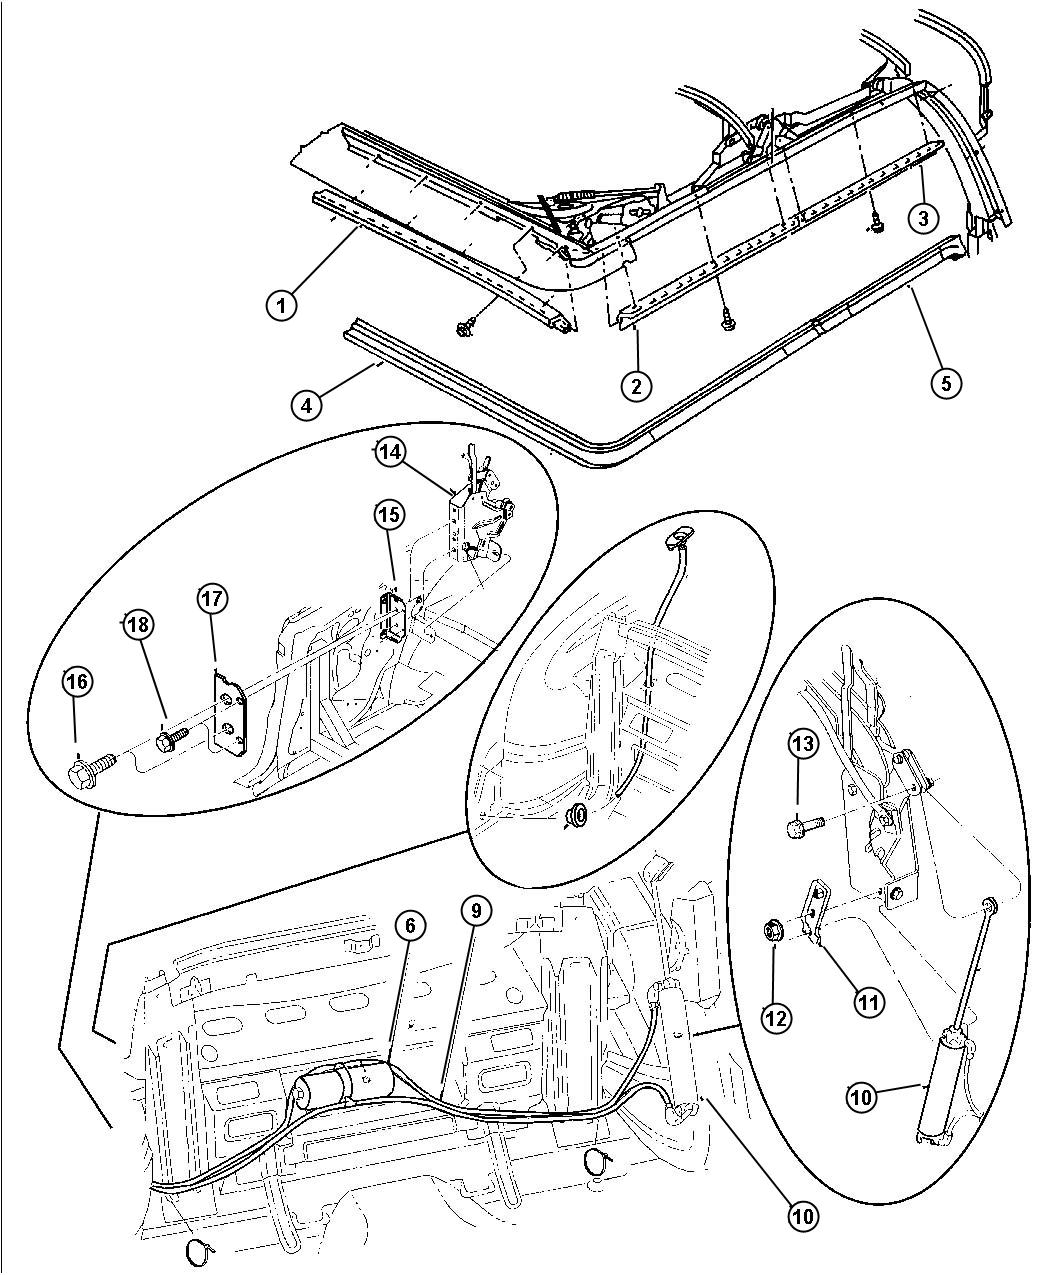 2000 Chrysler Sebring JXI Convertible 2.5L V6 SOHC 24V